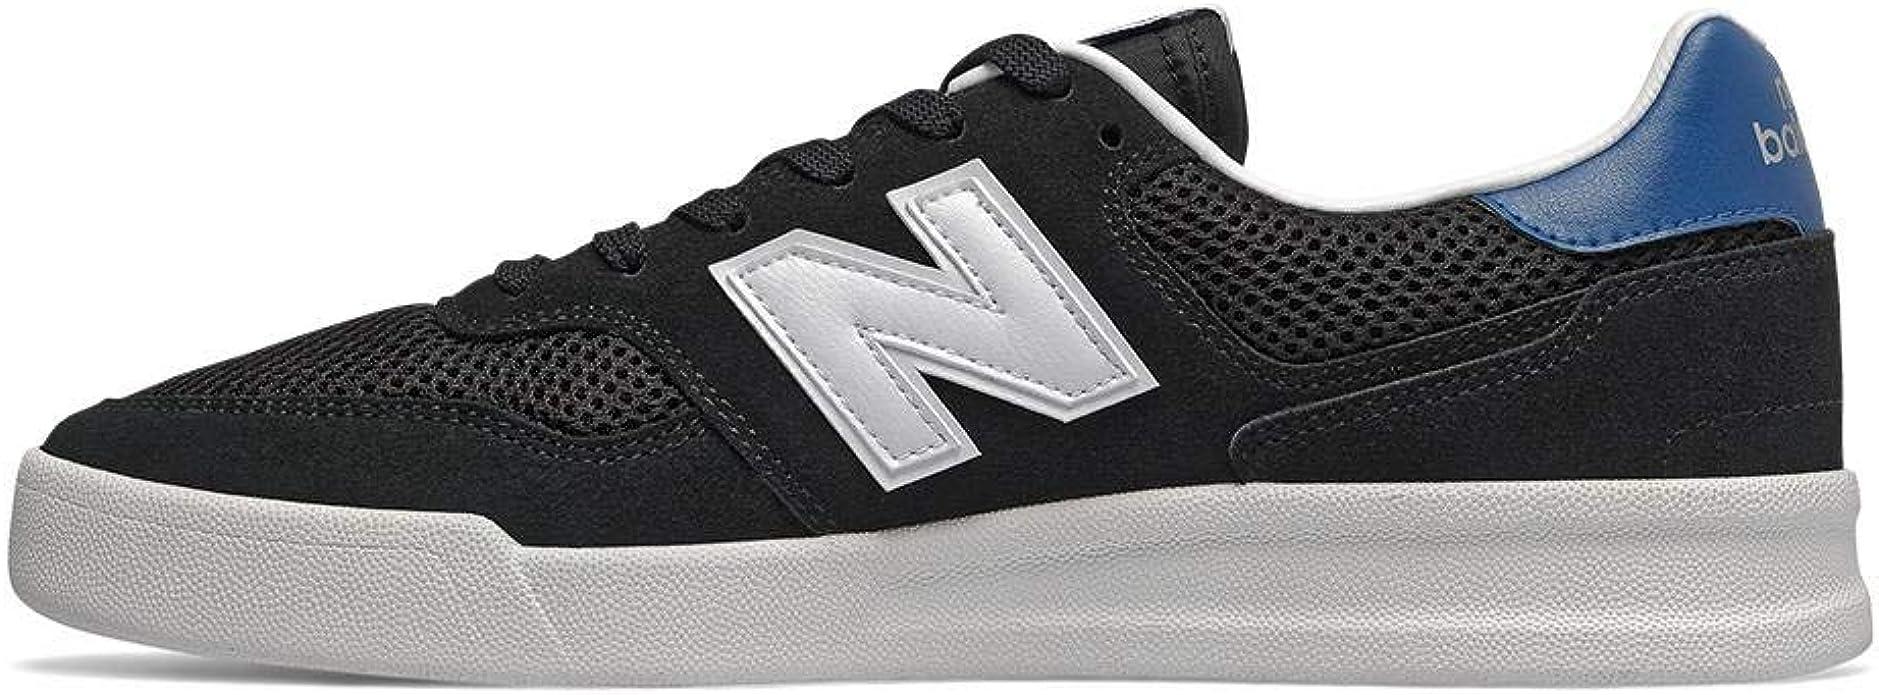 Amazon.com   New Balance Men's Crt300v2   Fashion Sneakers